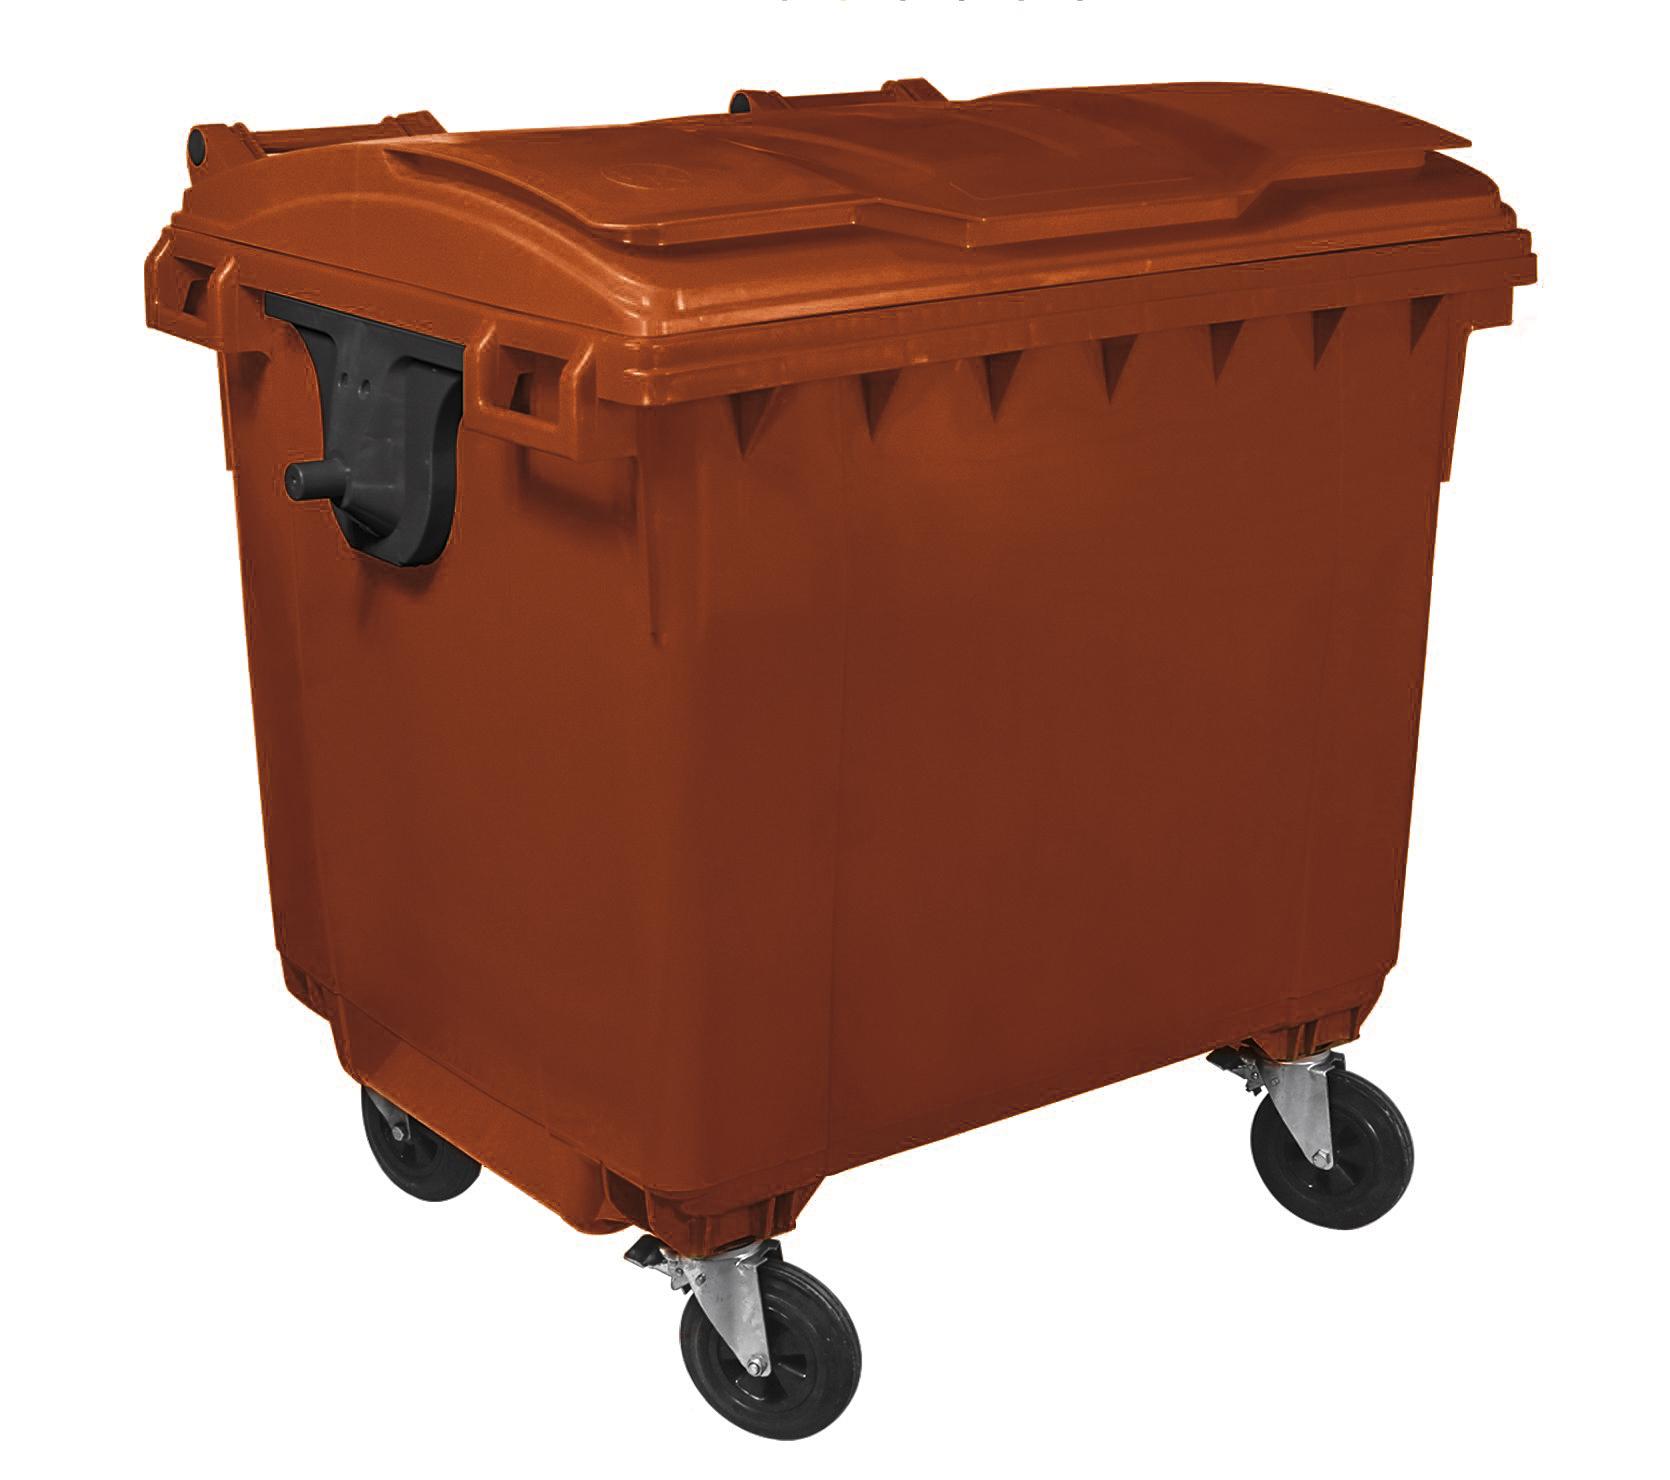 Container Hdpe Clf 1100l Cu Capac Plat Maro 2021 sanito.ro